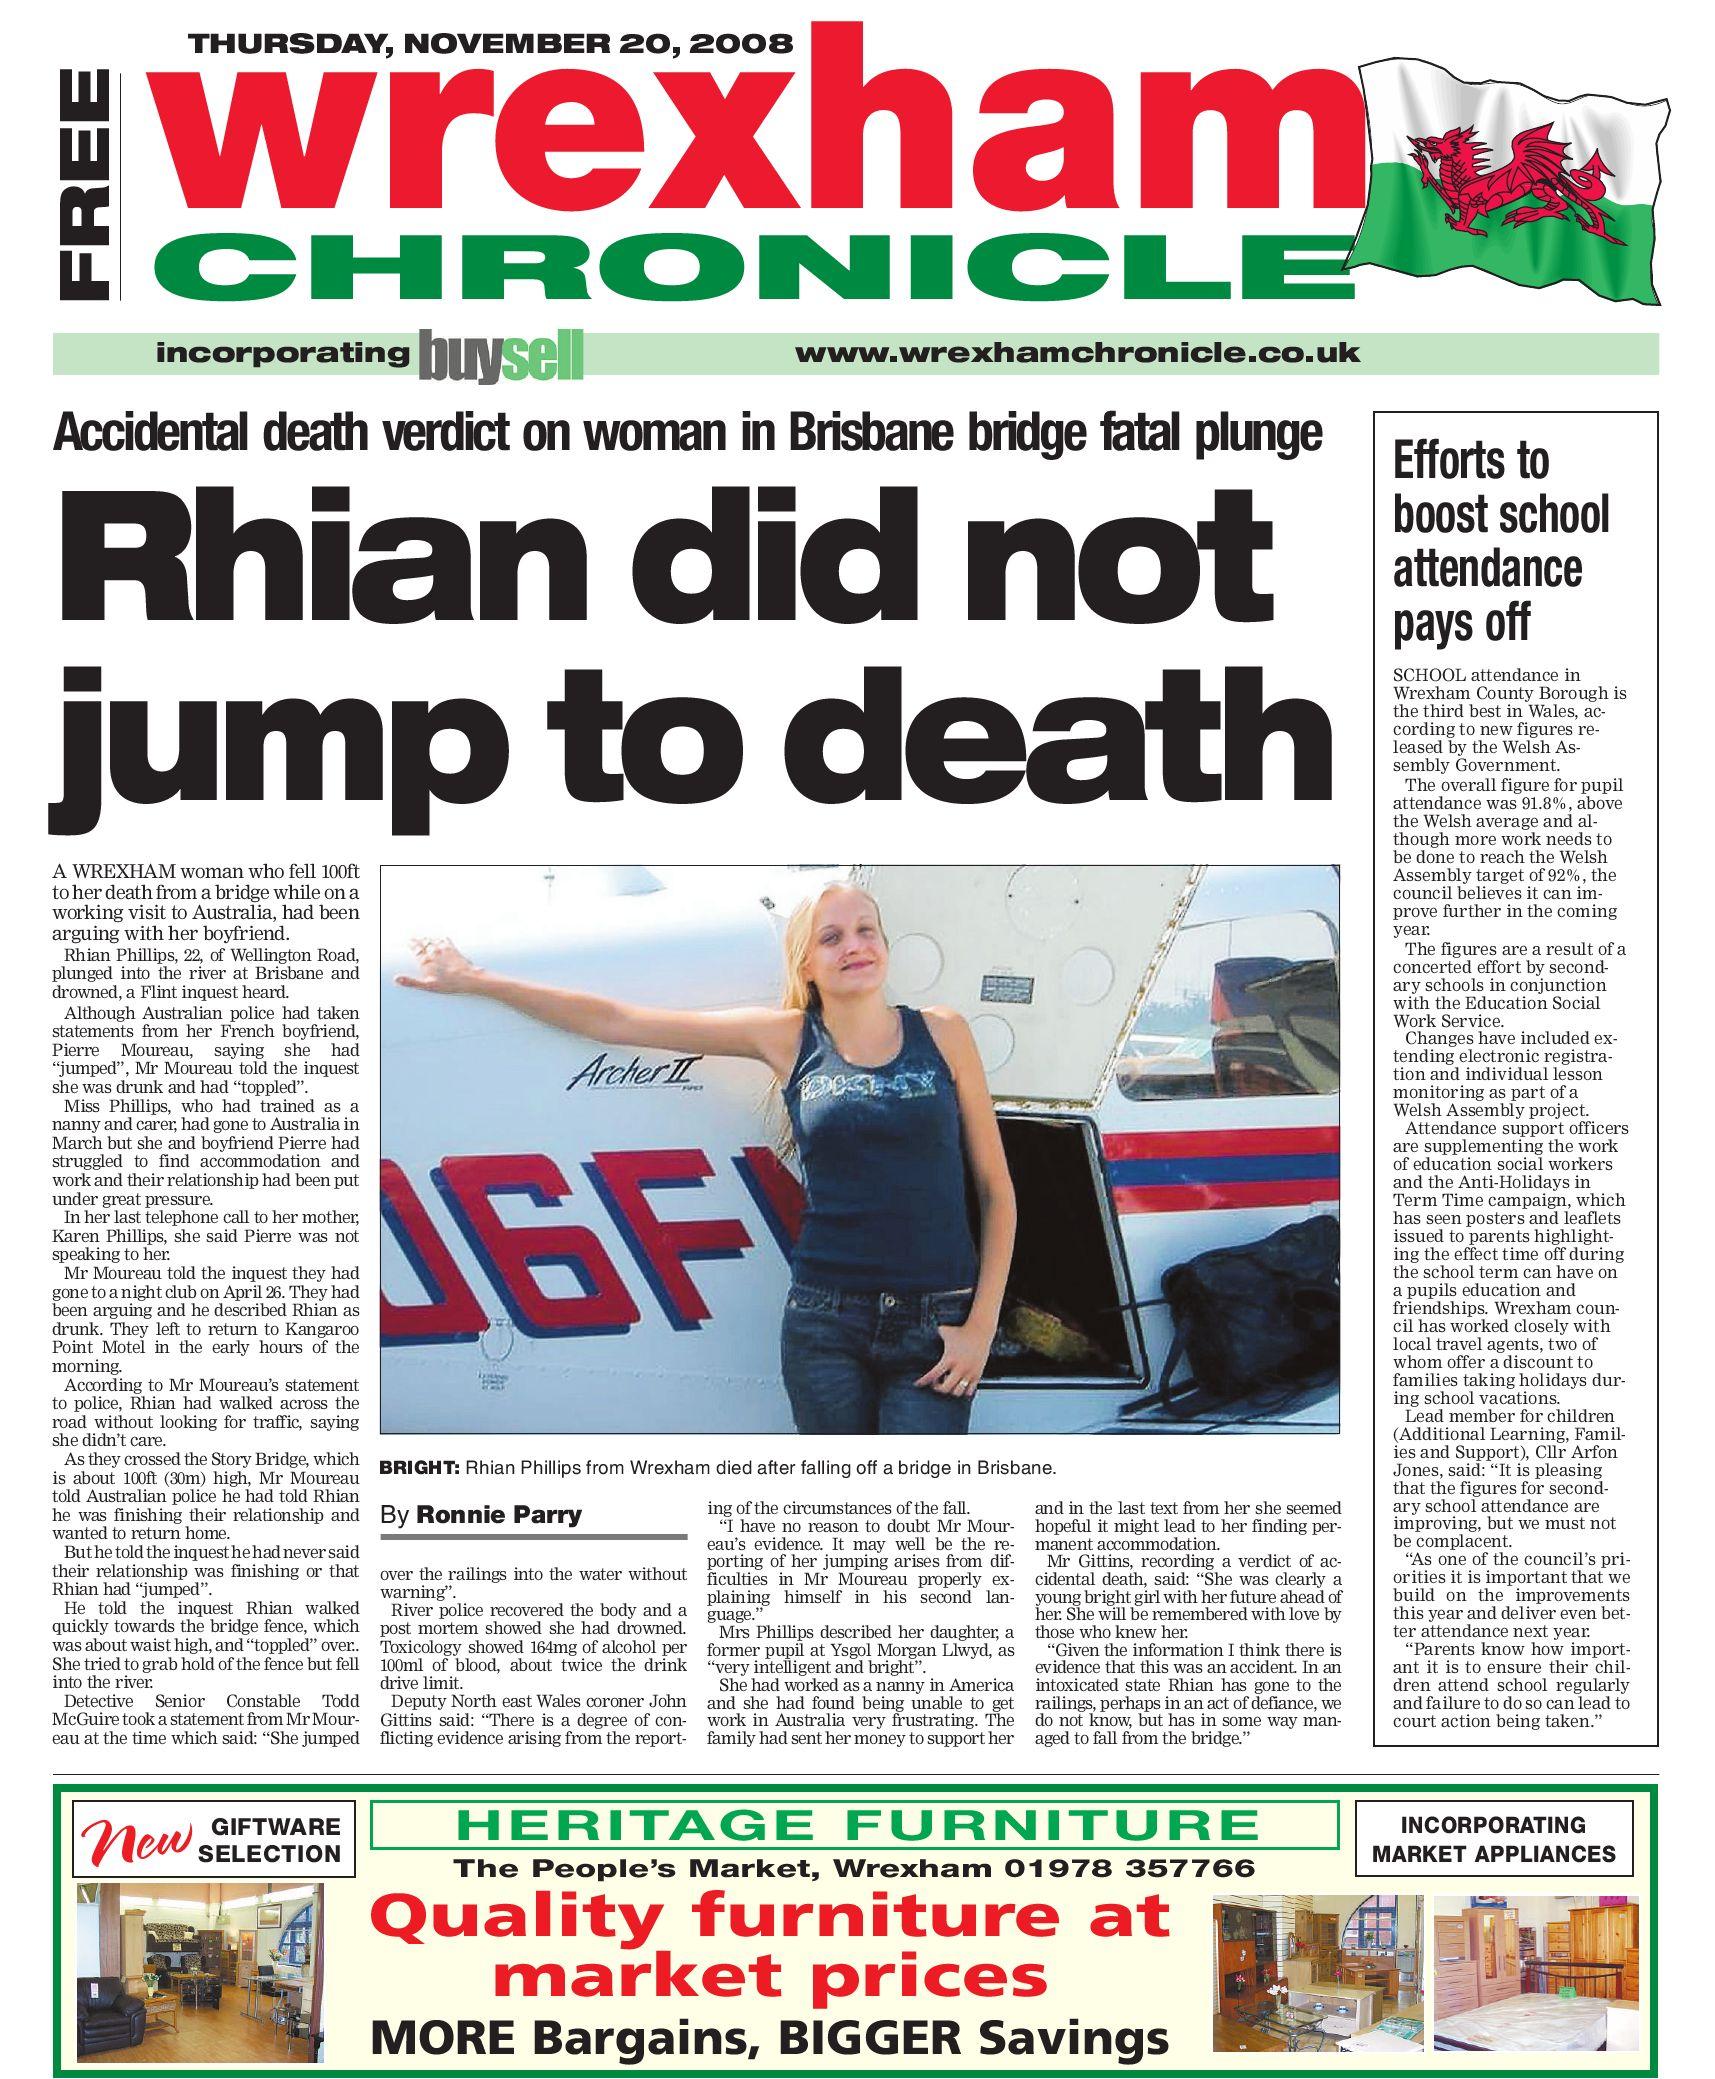 82aa54b8080a Wrexham Chronicle, 20/11/08 by James Shepherd - issuu